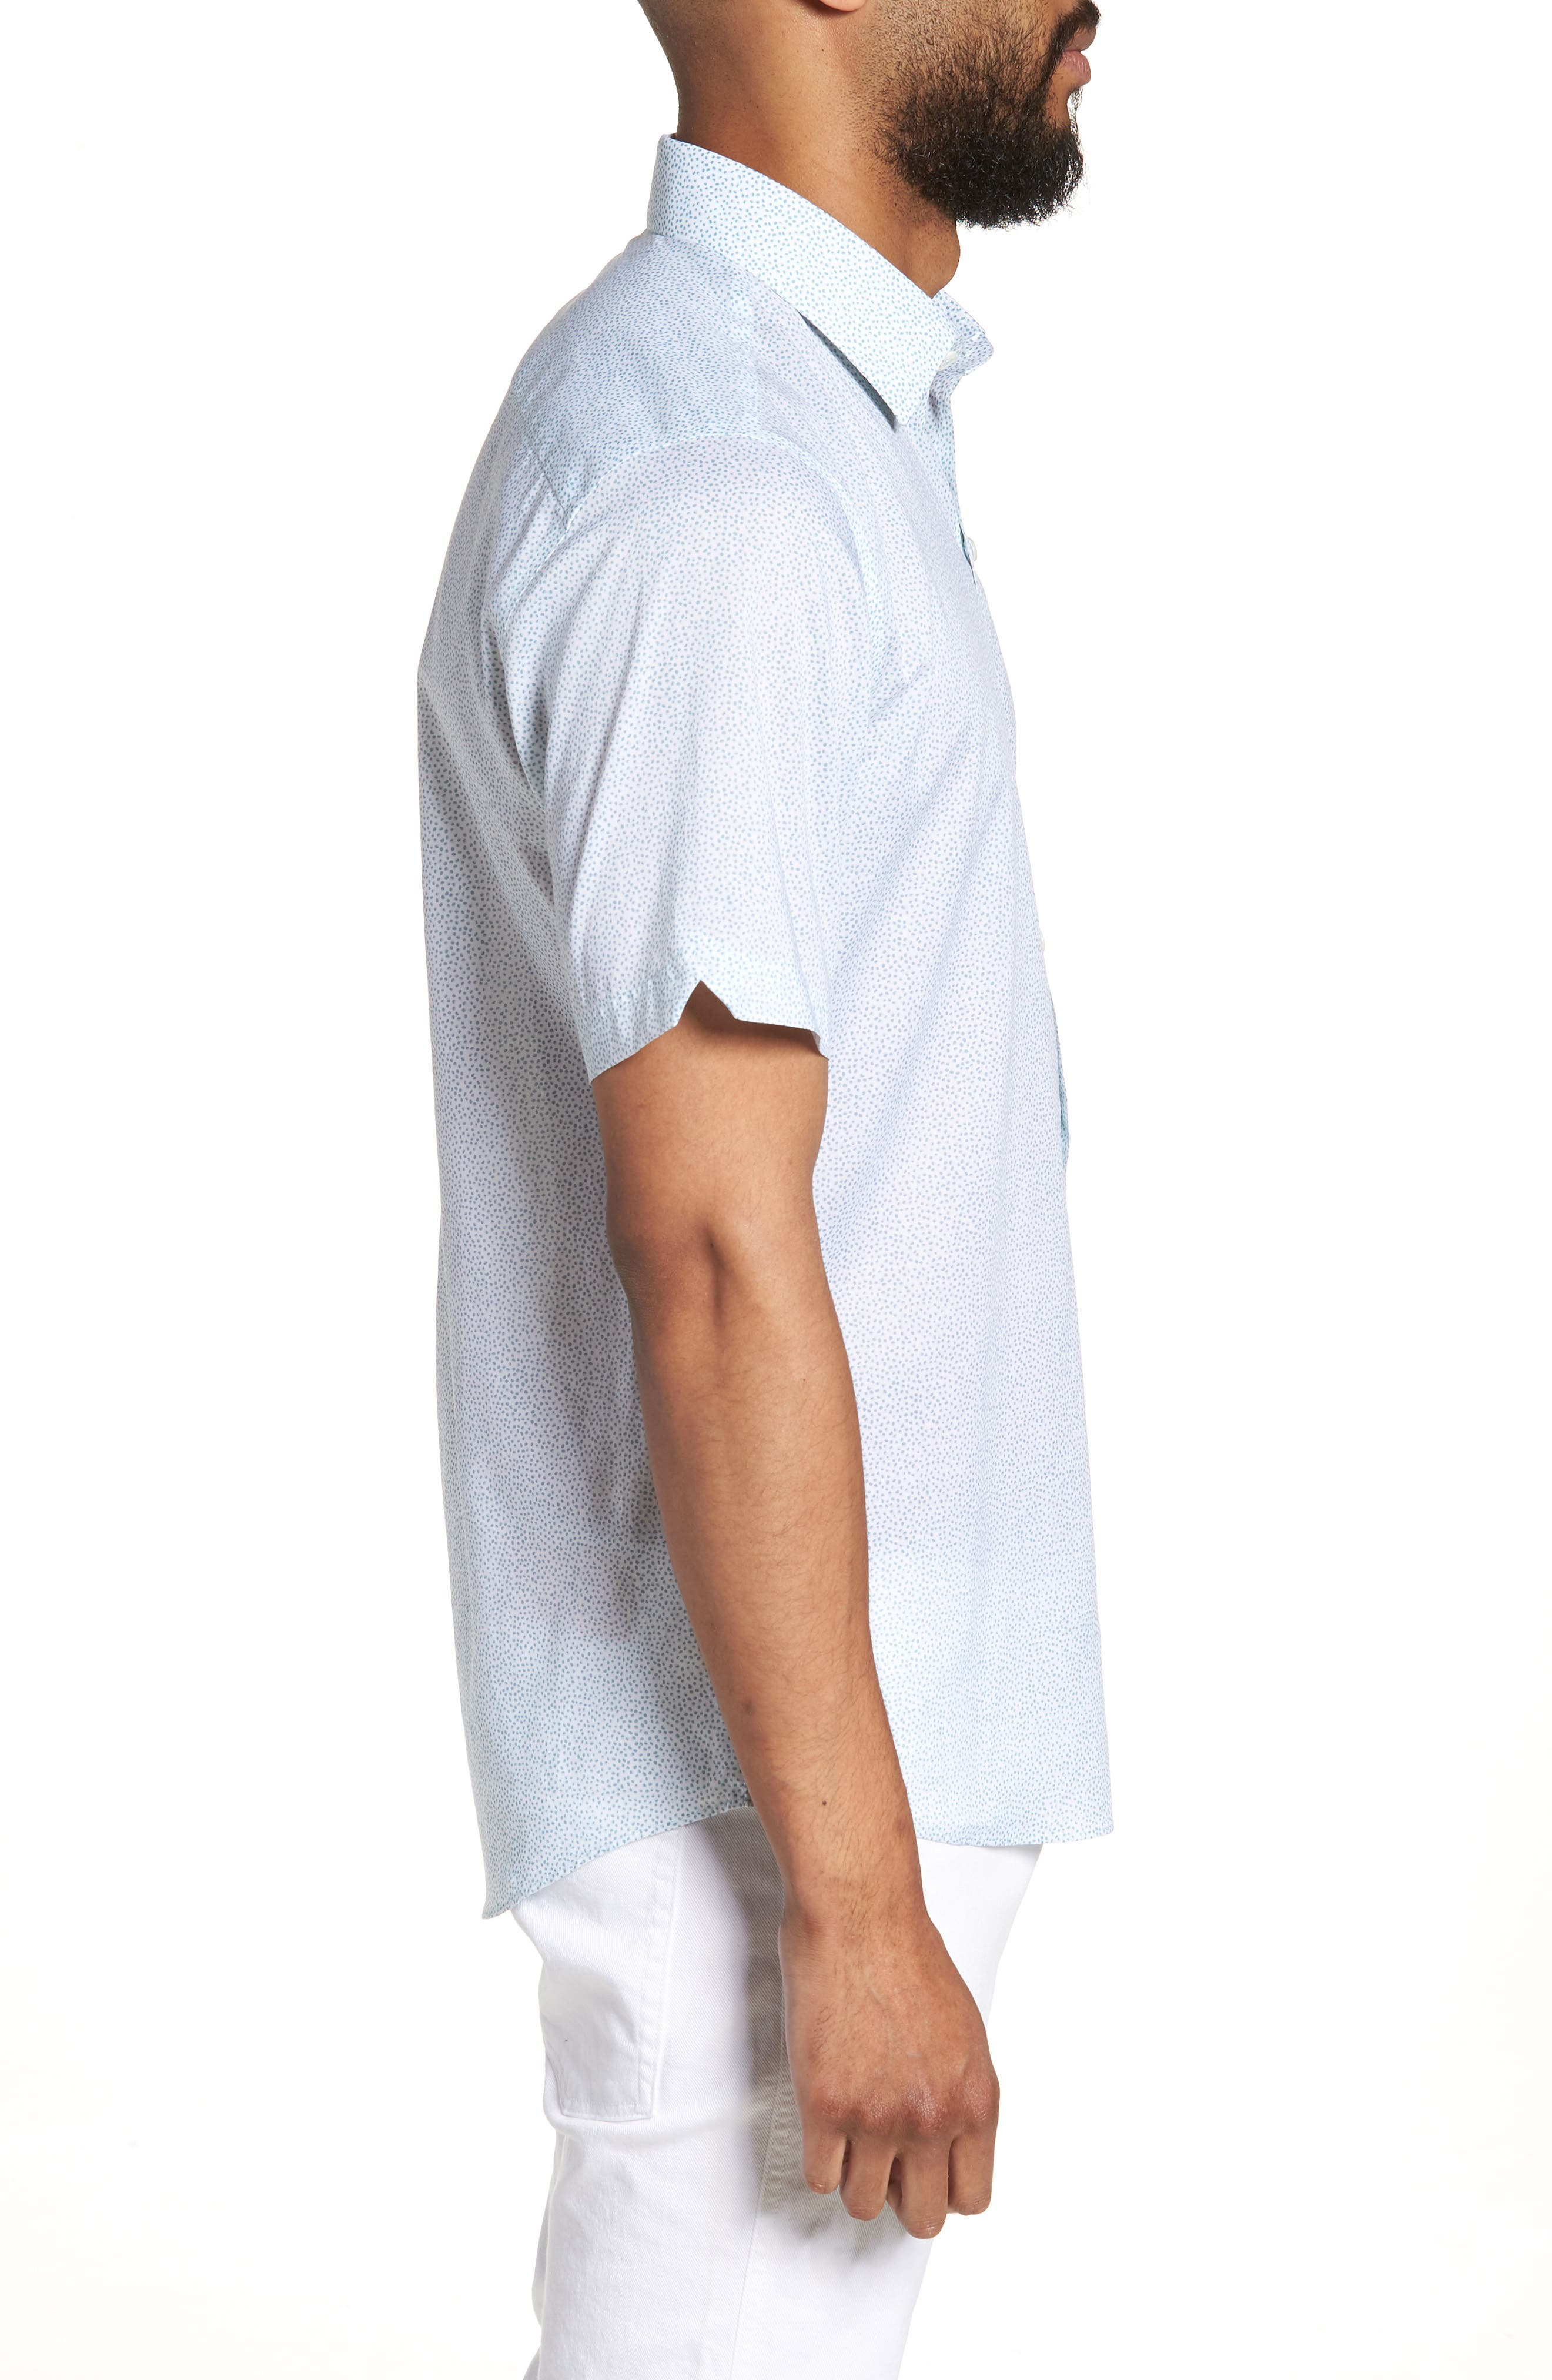 Fung Regular Fit Sport Shirt,                             Alternate thumbnail 3, color,                             WHITE